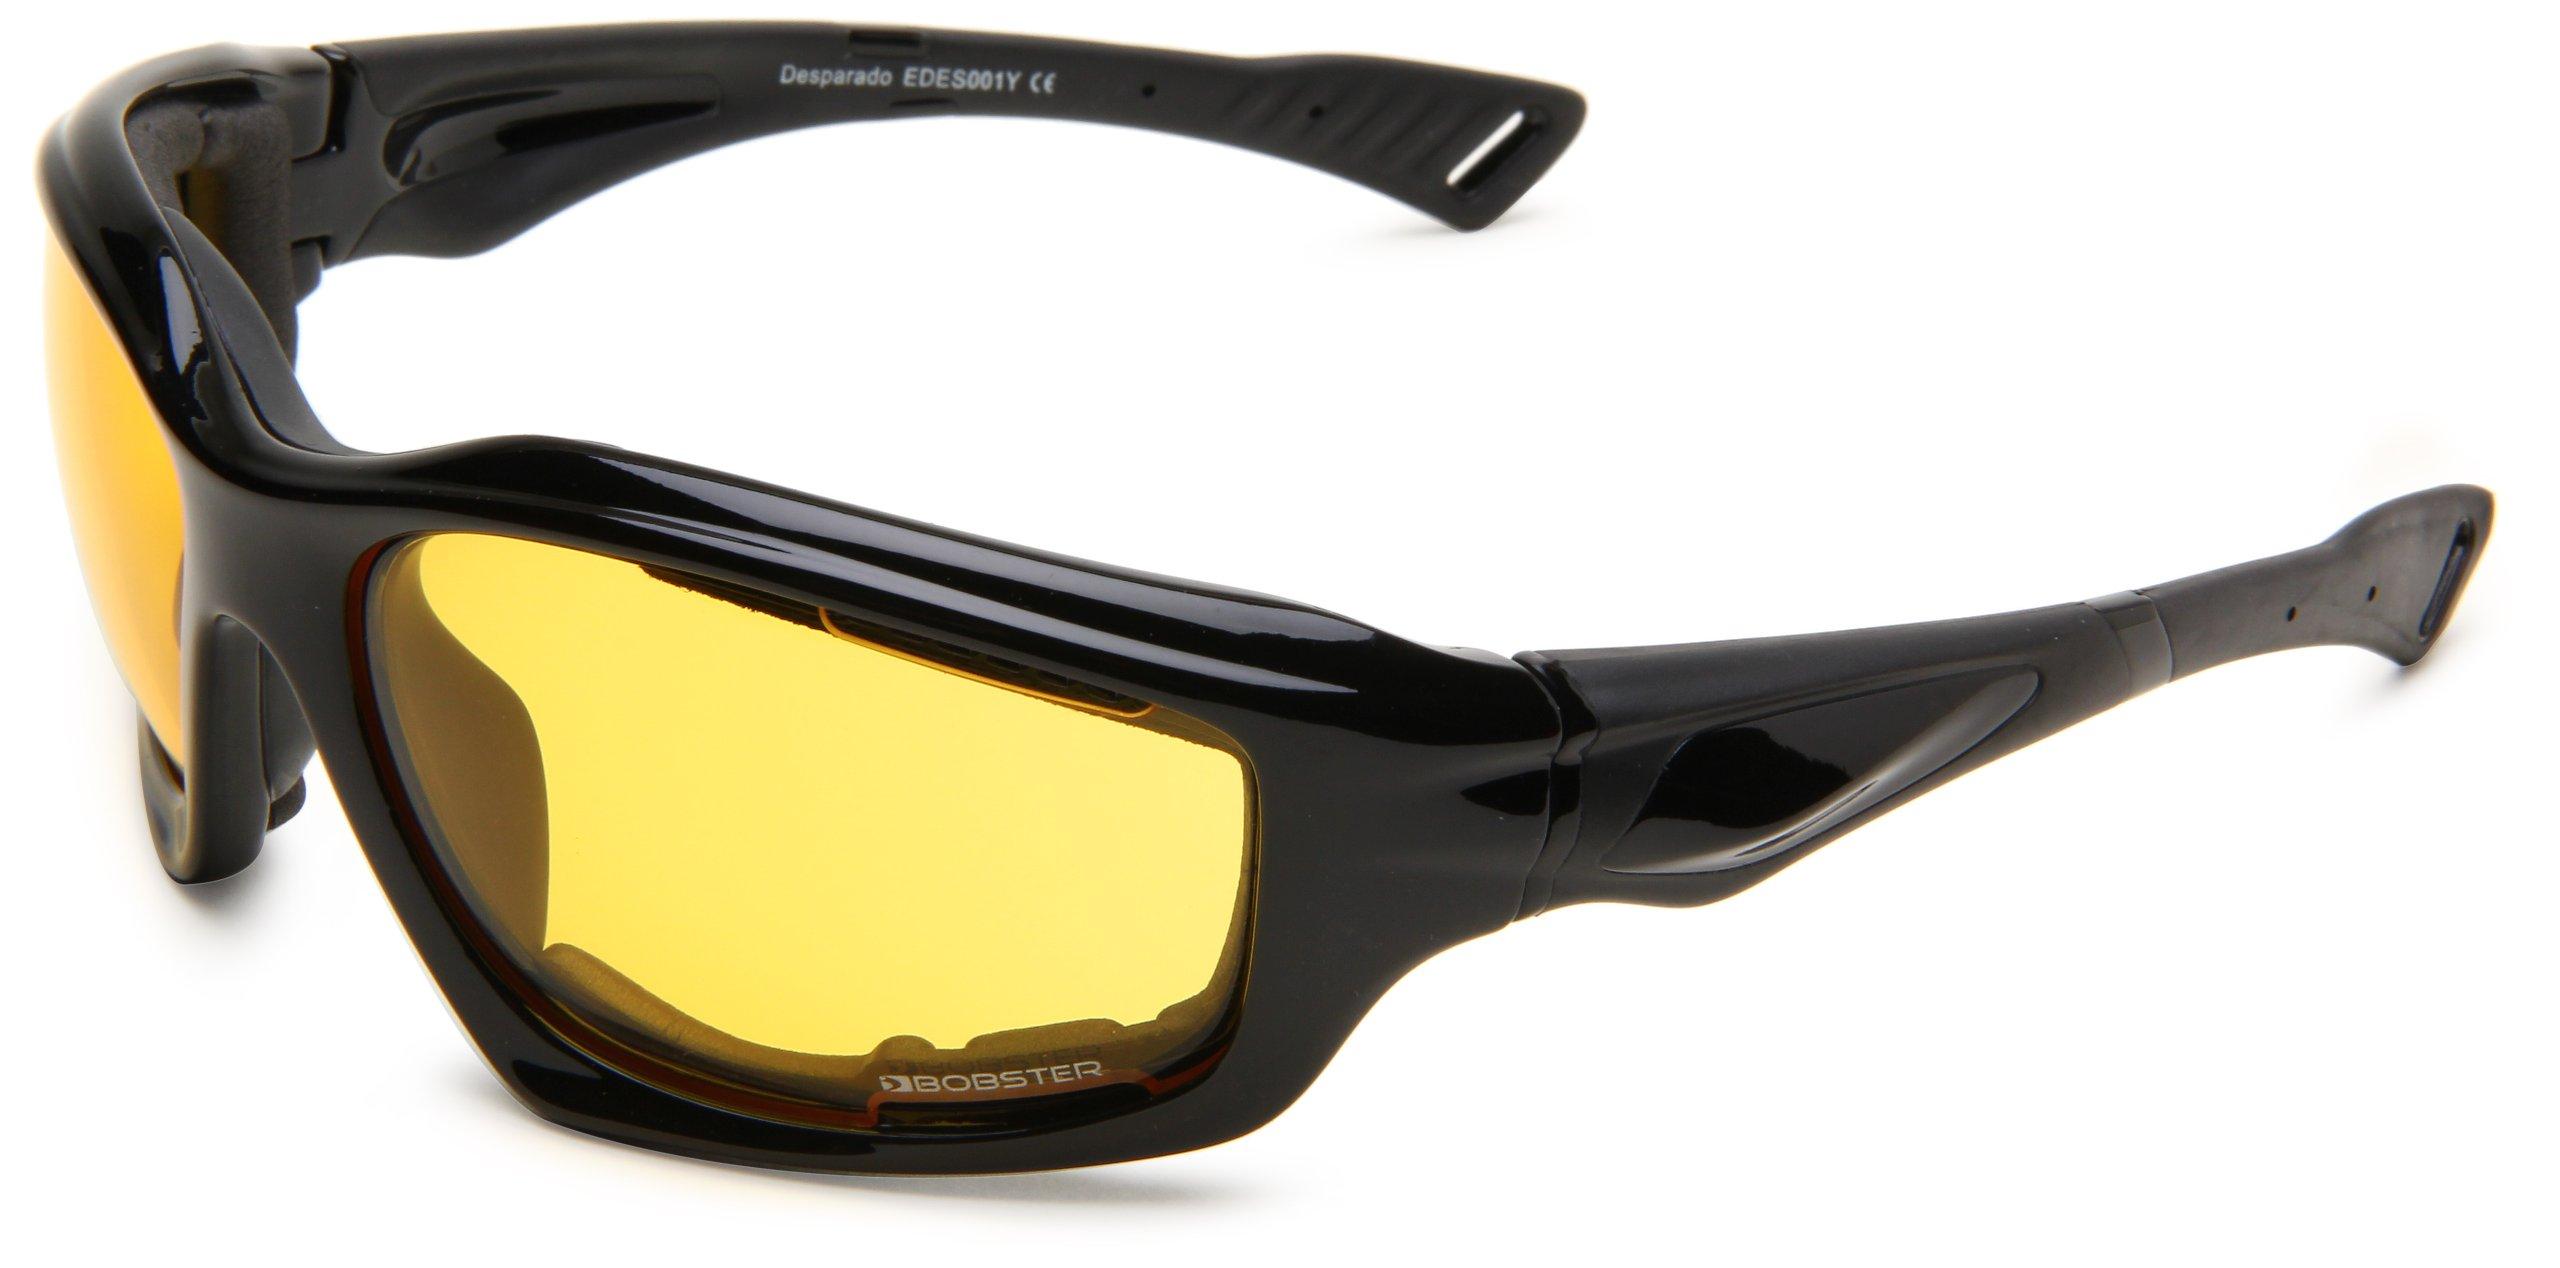 Bobster Desperado Square Sunglasses, Black Frame/Yellow Anti-Fog Lens with Foam by Bobster